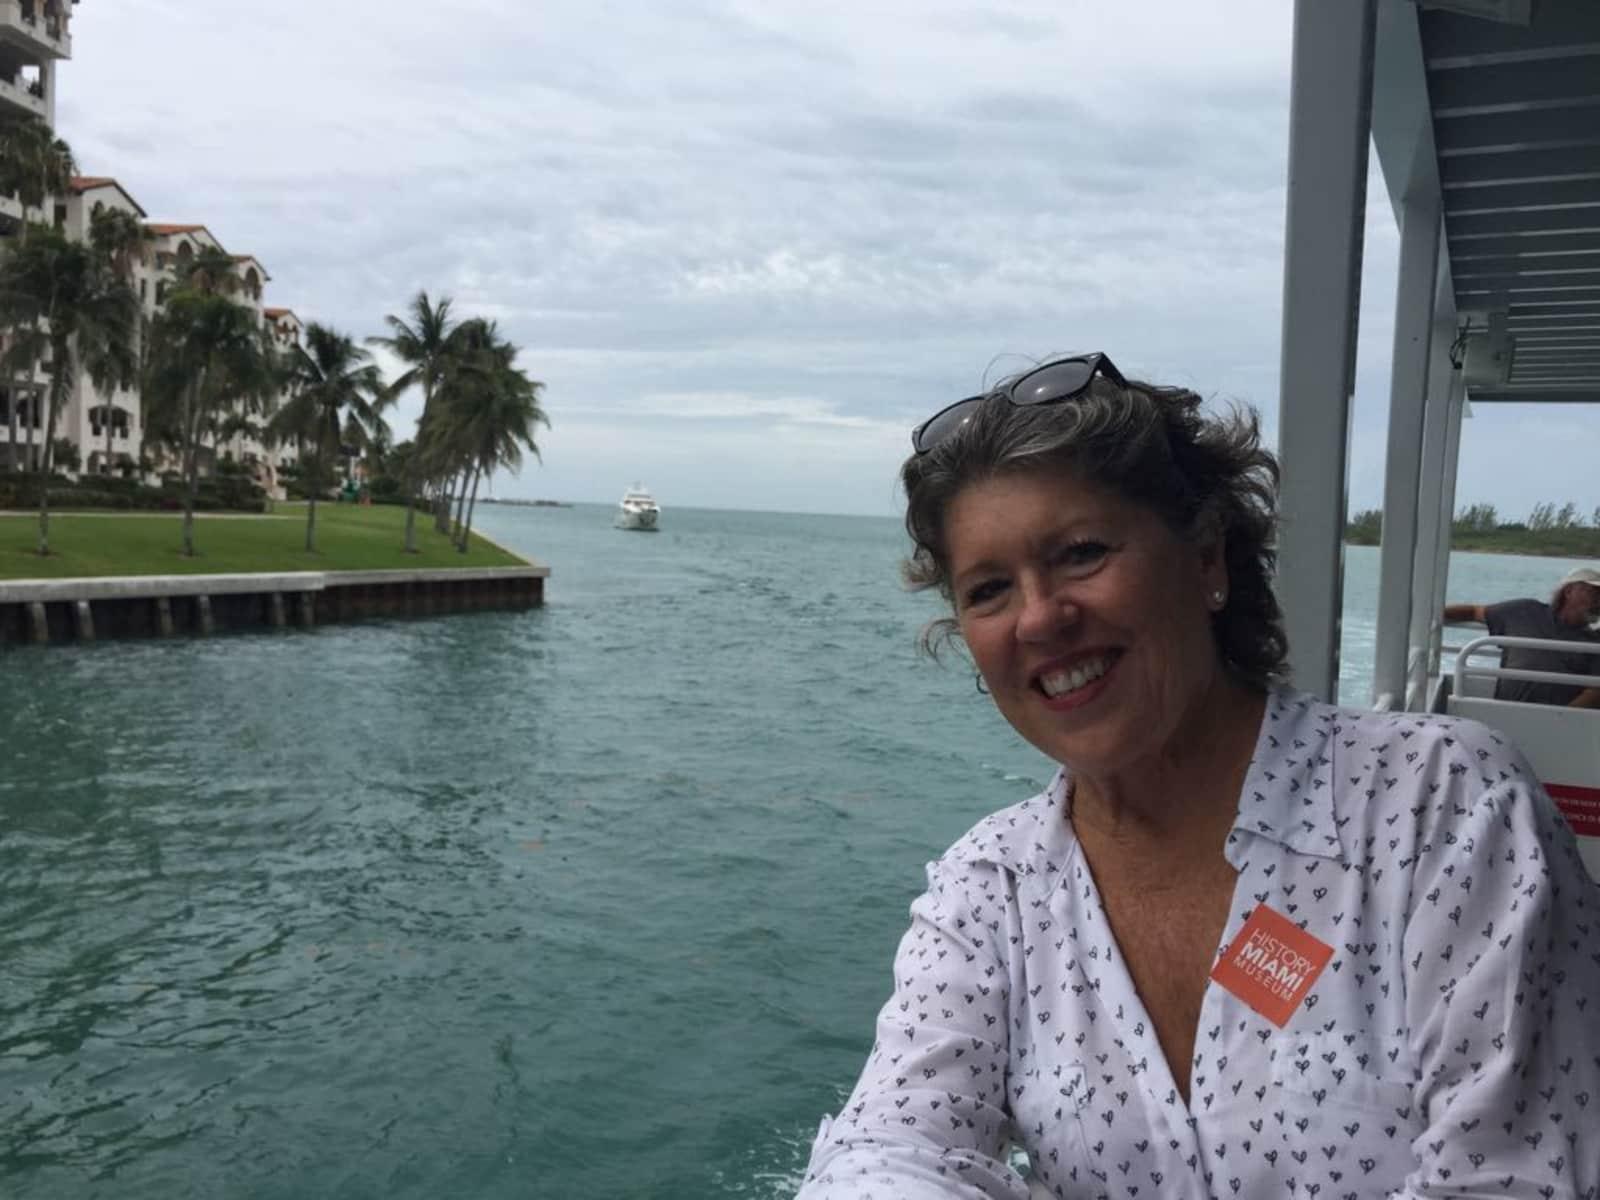 Sharon from Miami, Florida, United States